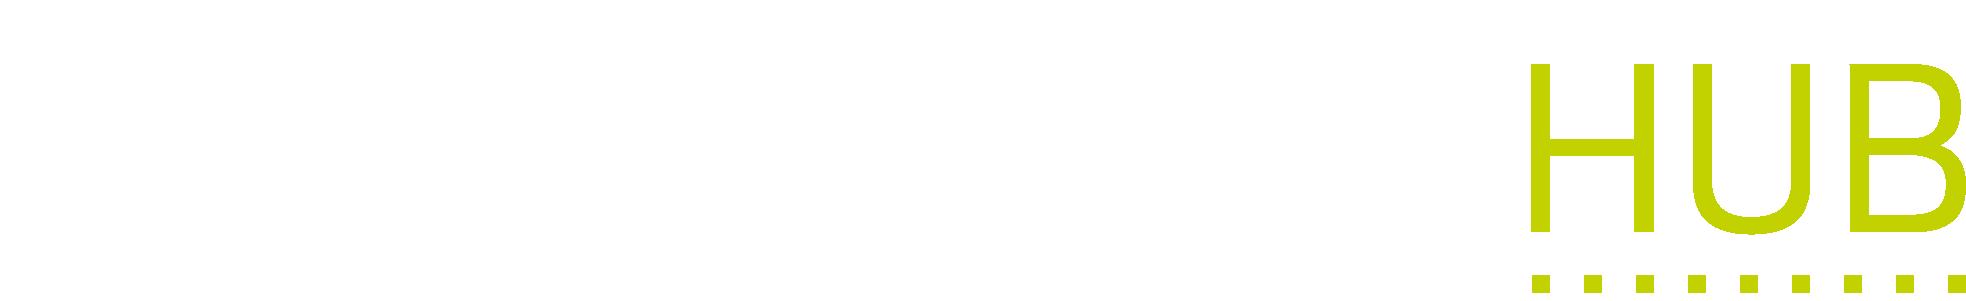 DIGITAL360_Hub_Logo_white[no_payoff]